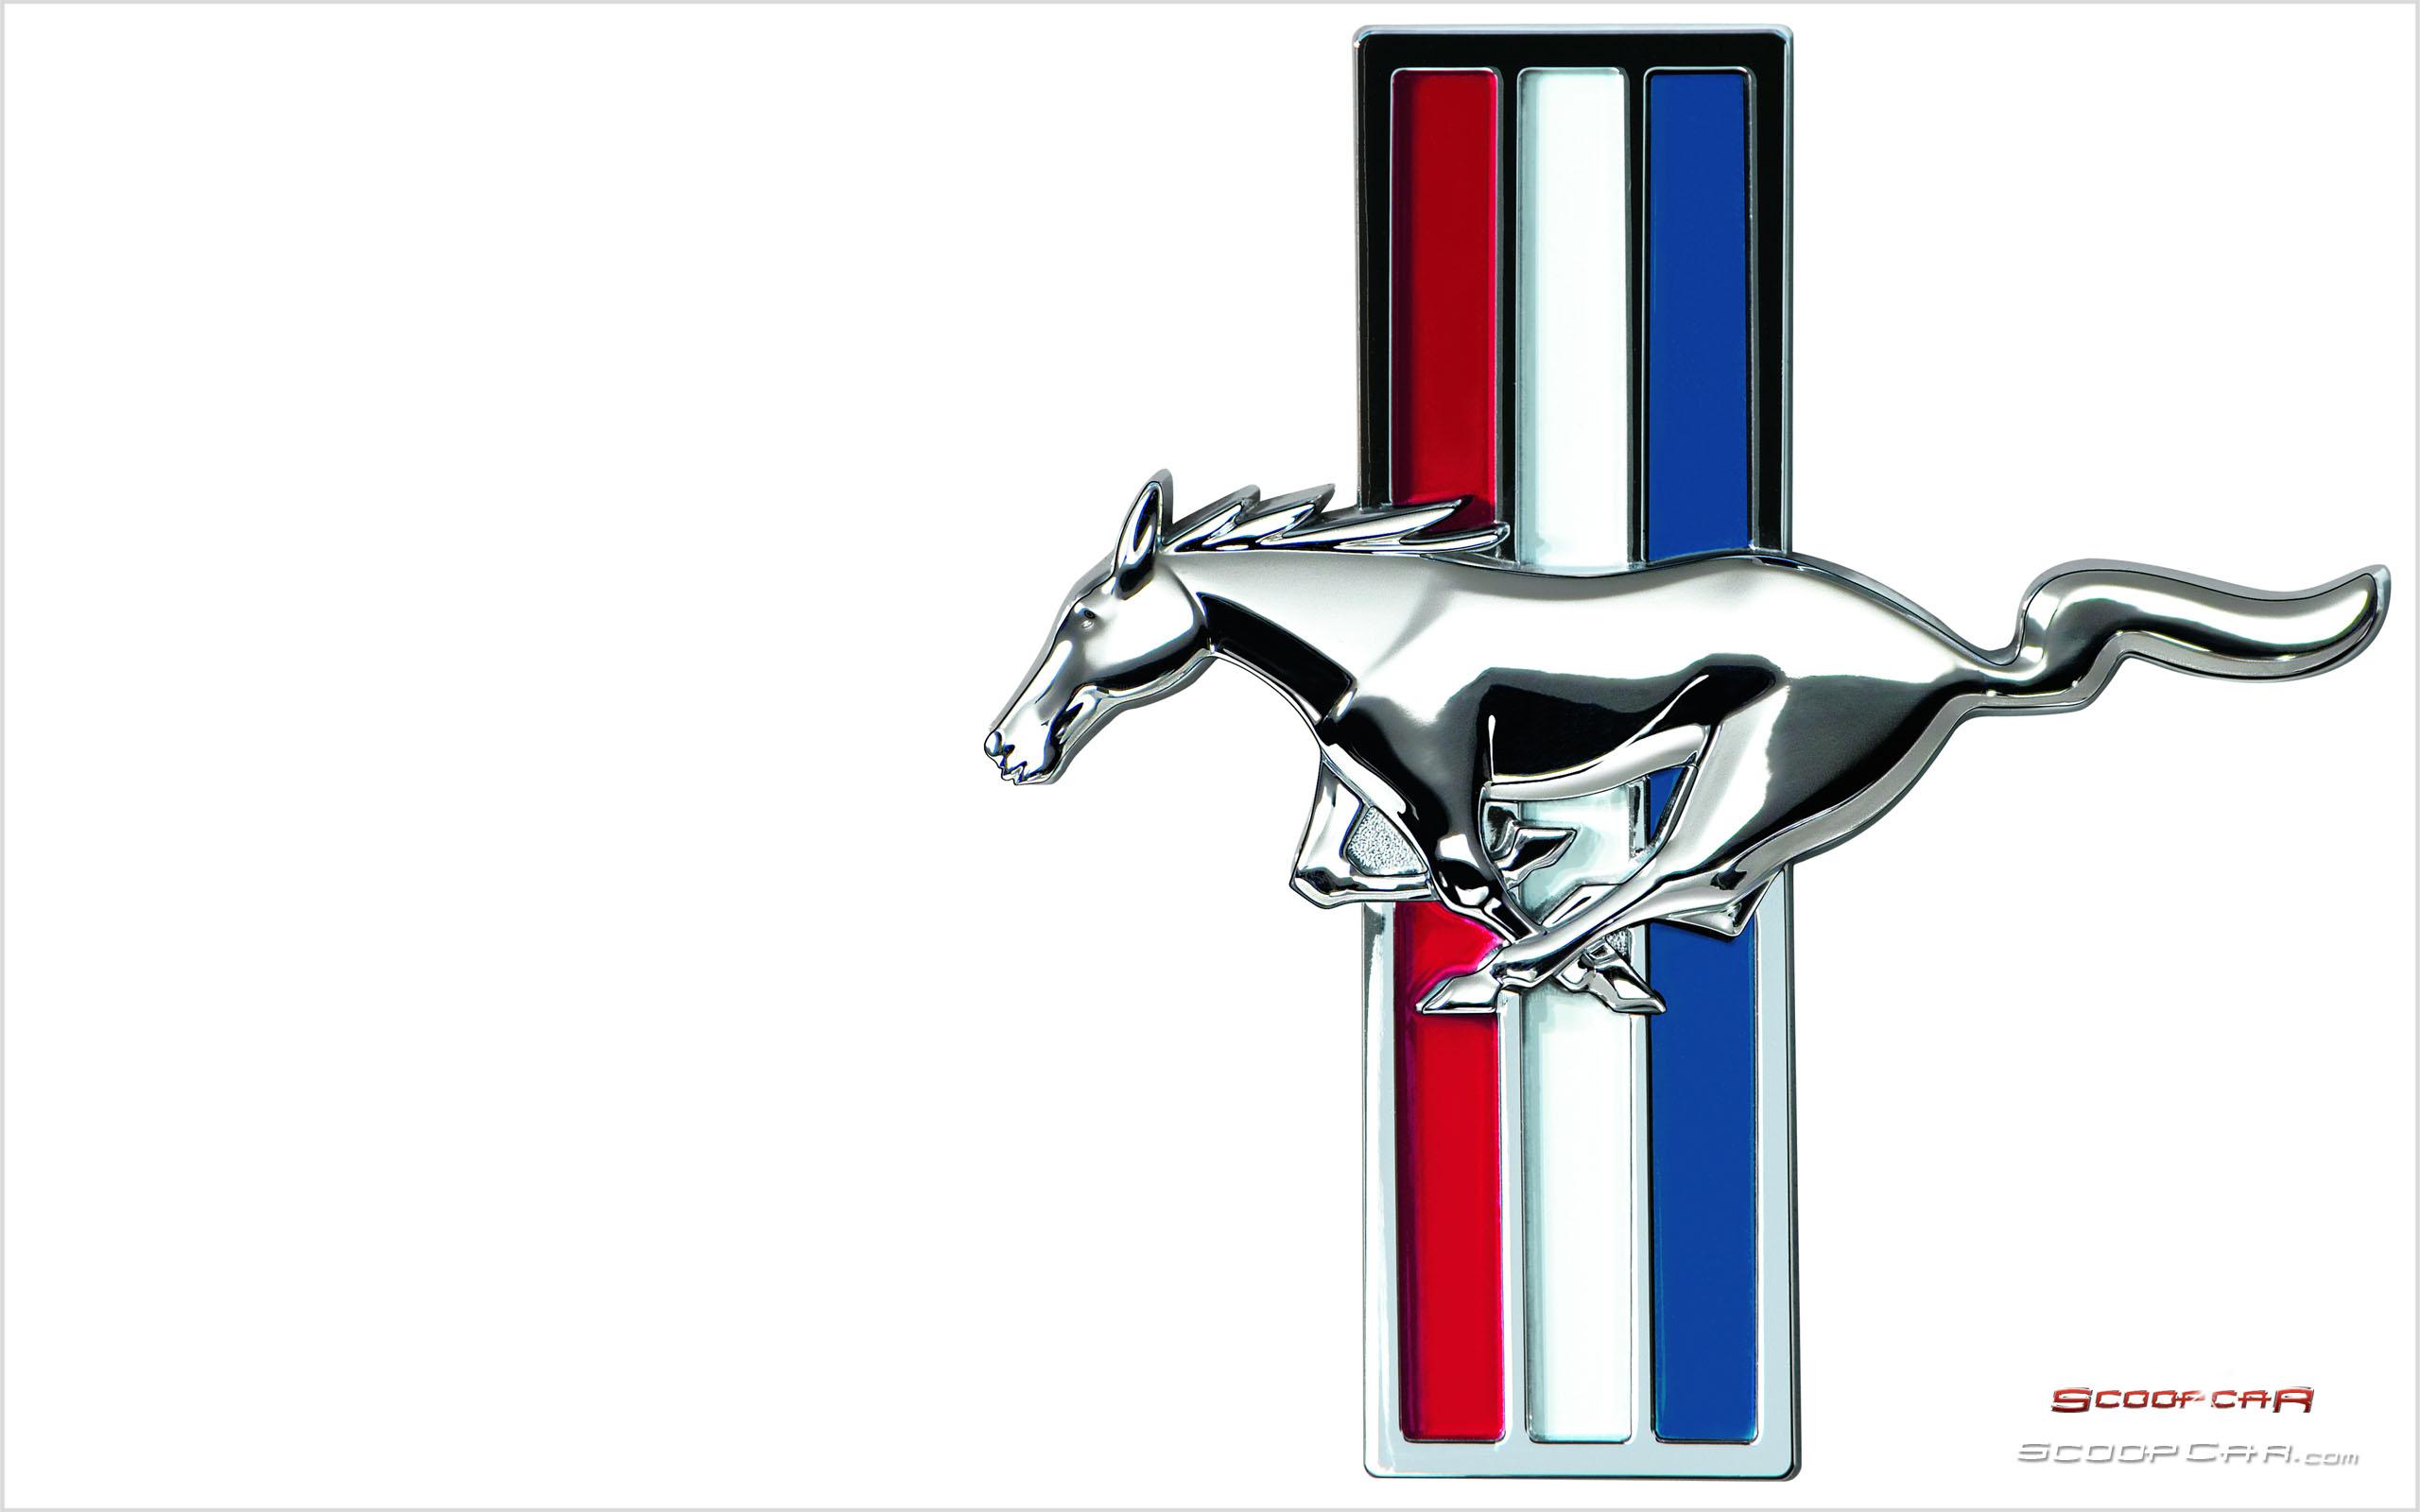 Mustang car logos